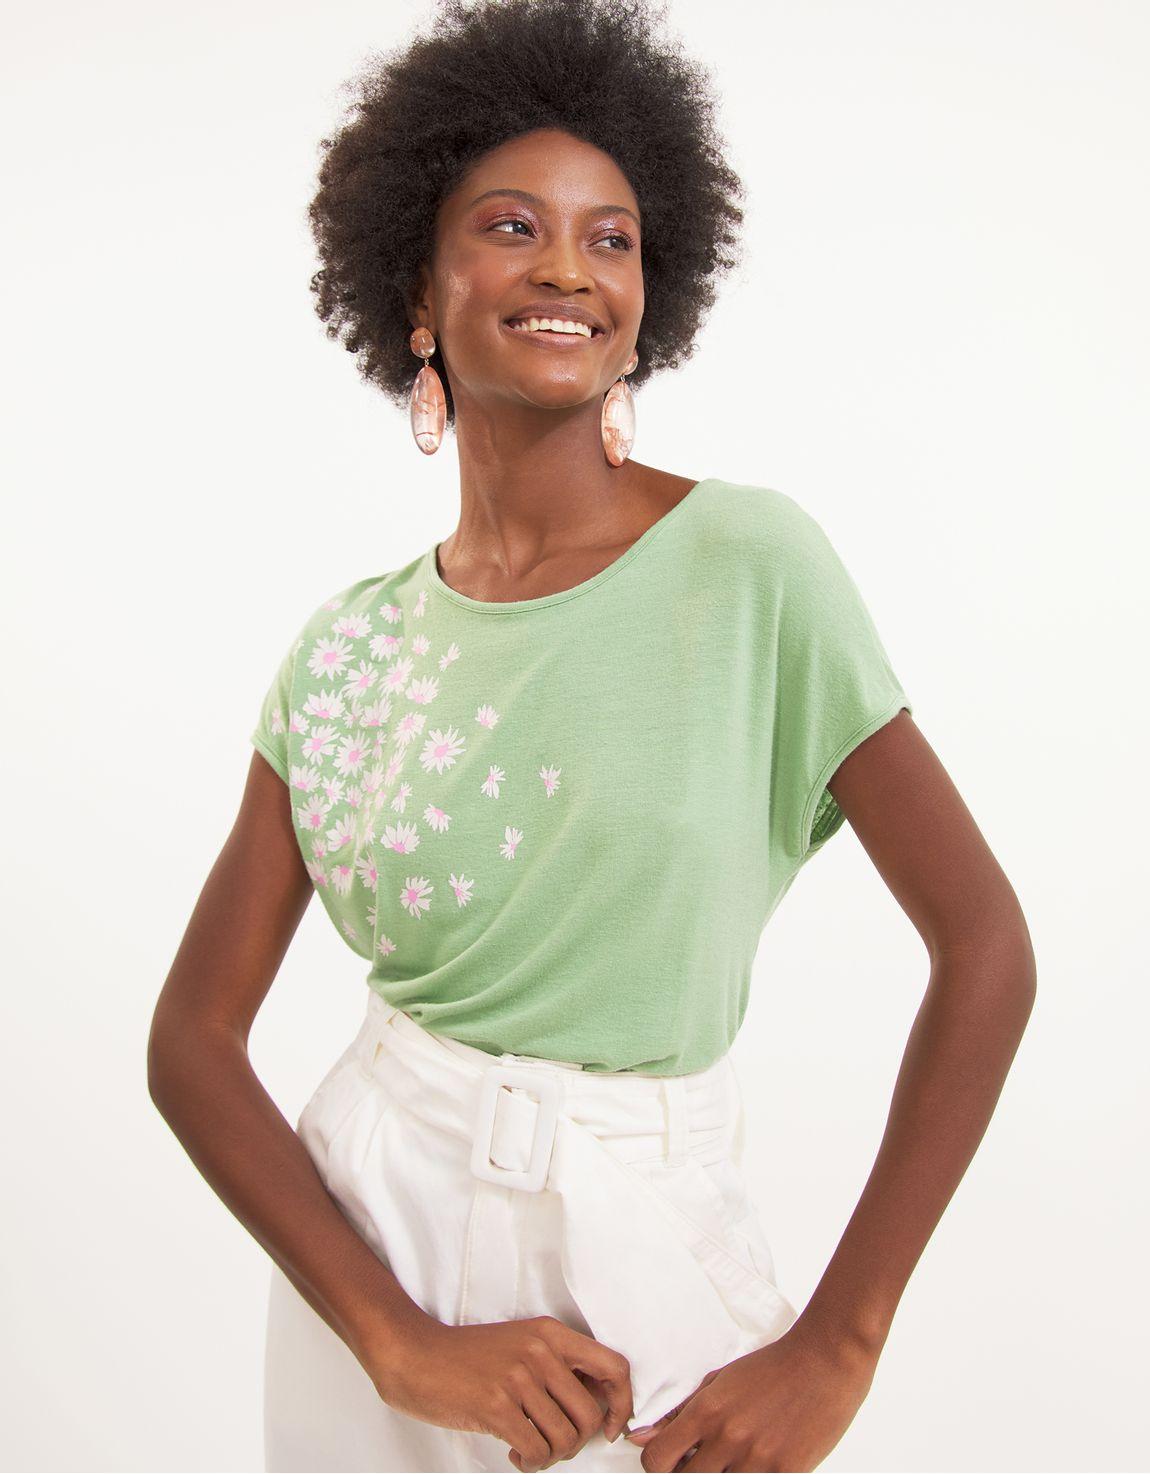 T-shirt margaridas ombro